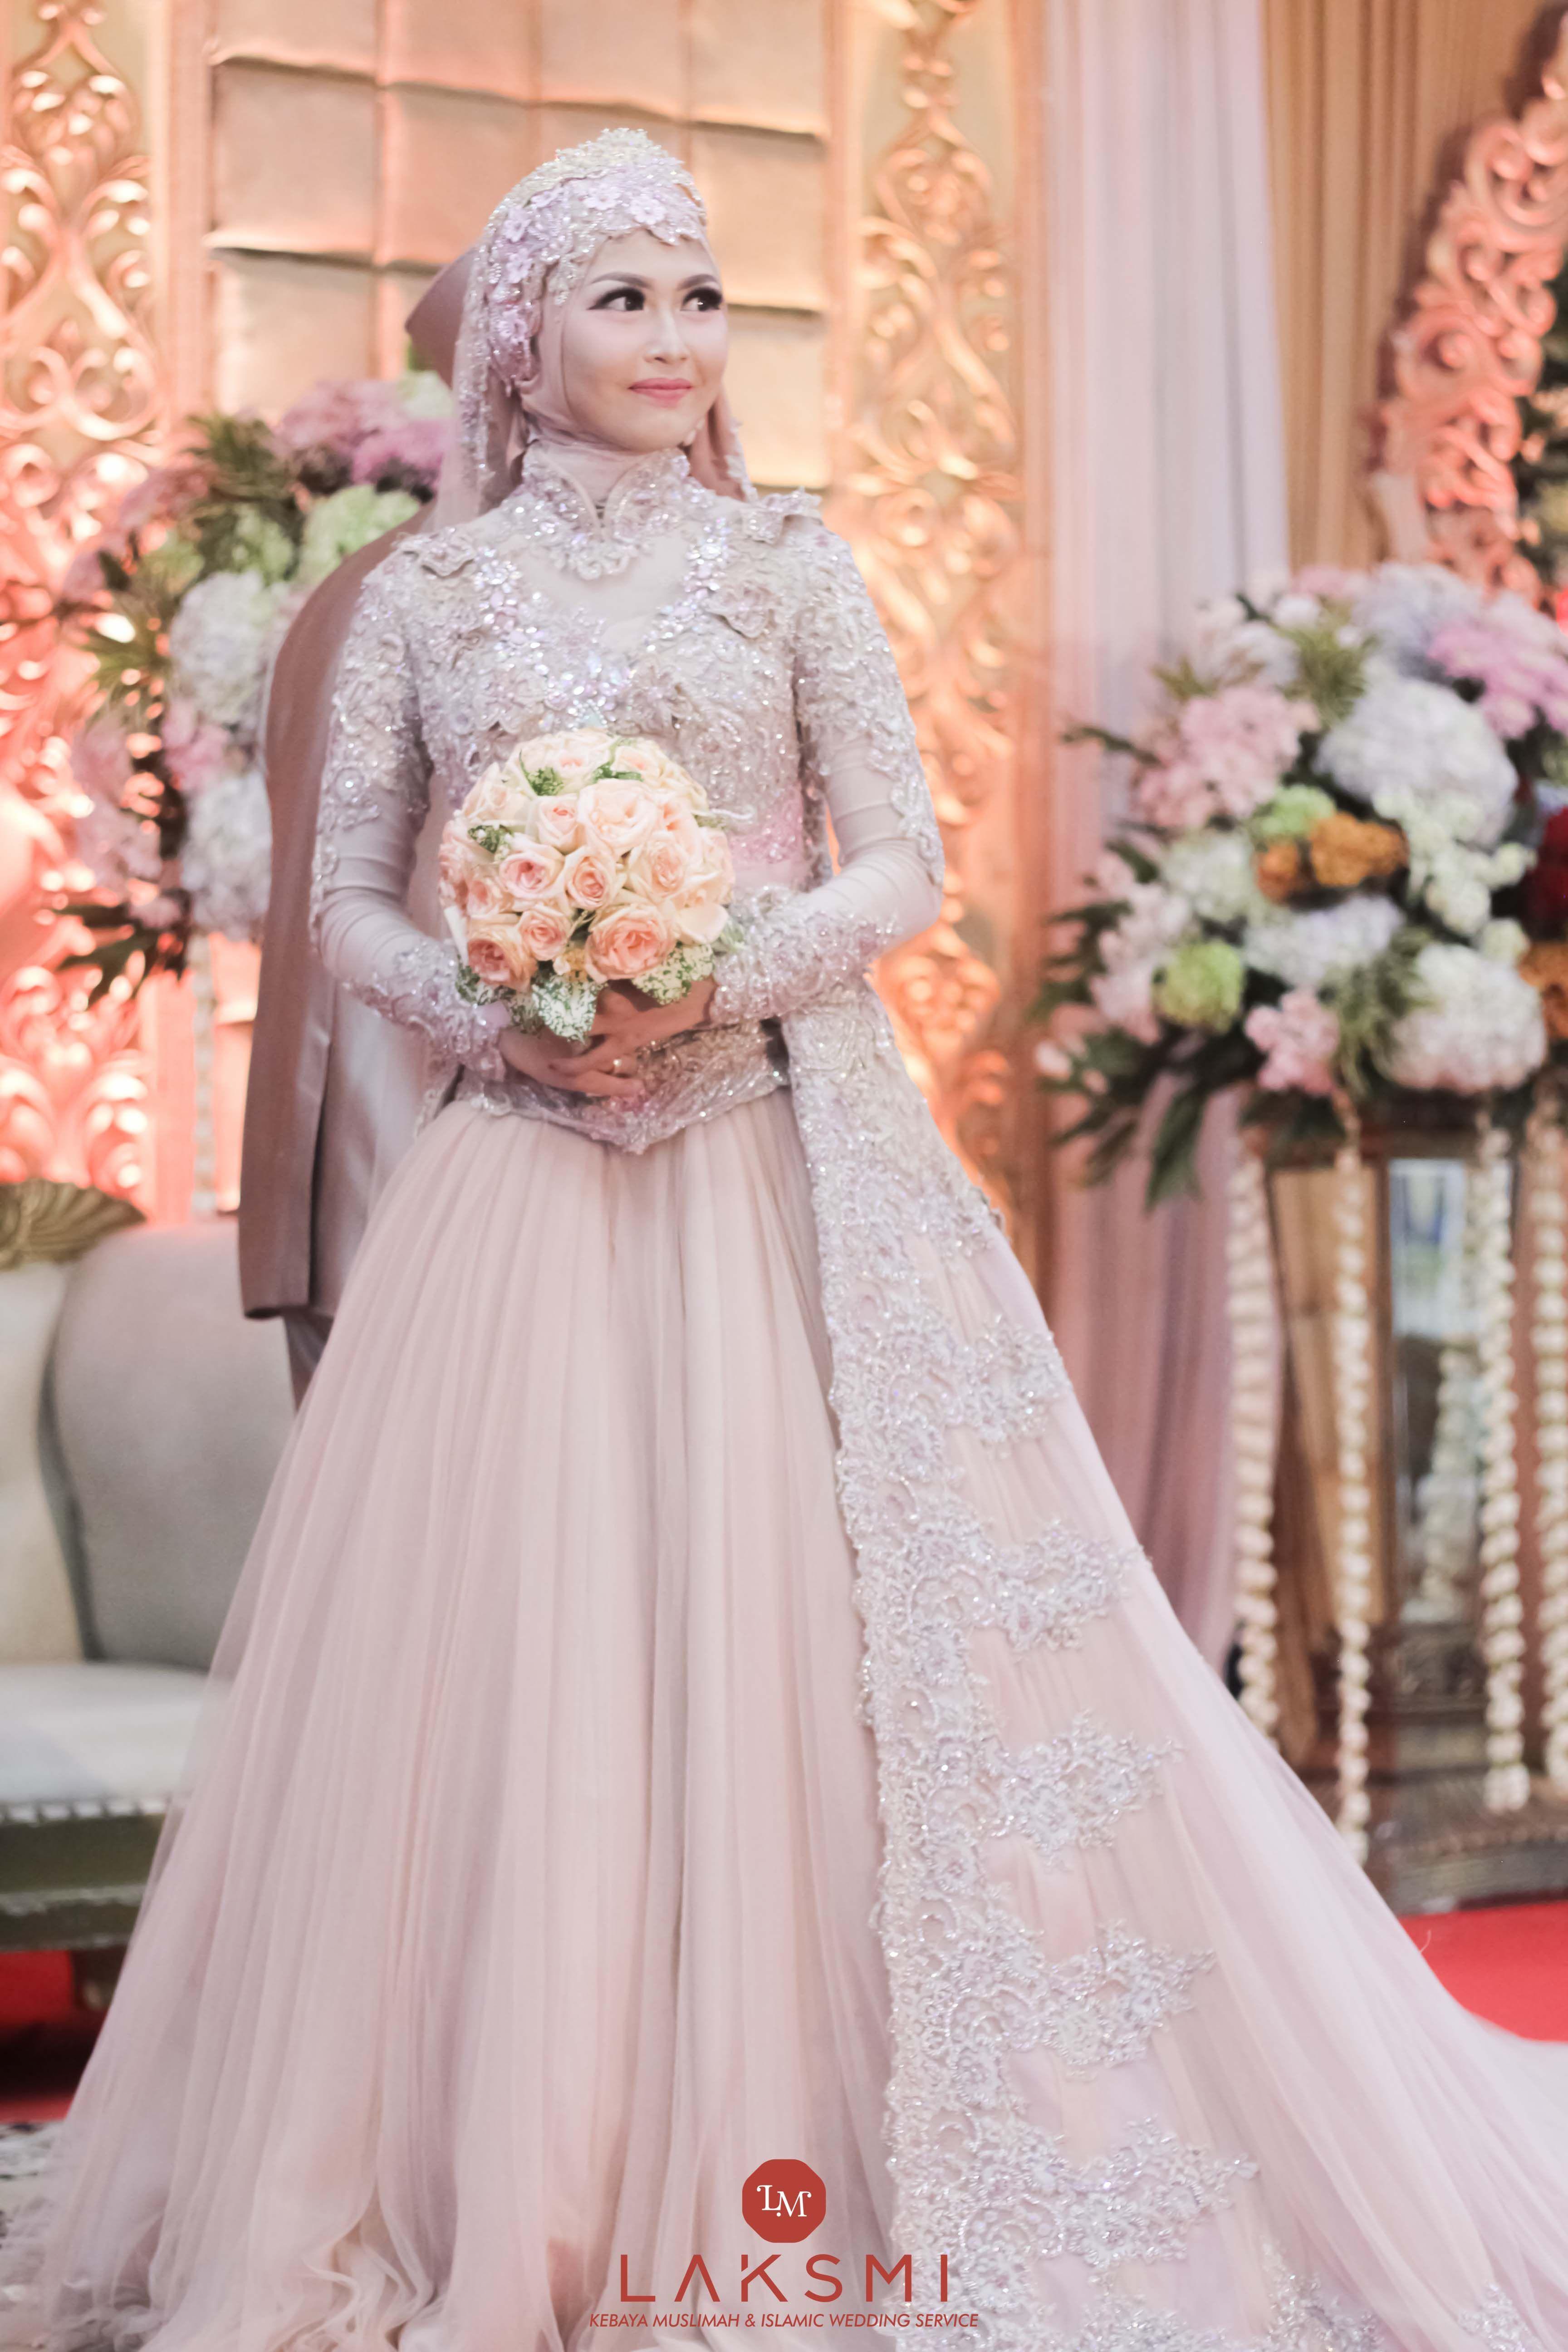 Pin Oleh Fara Hani Di Laksmi Wedding Inspiration Gaun Pengantin Perempuan Pengantin [ 5184 x 3456 Pixel ]